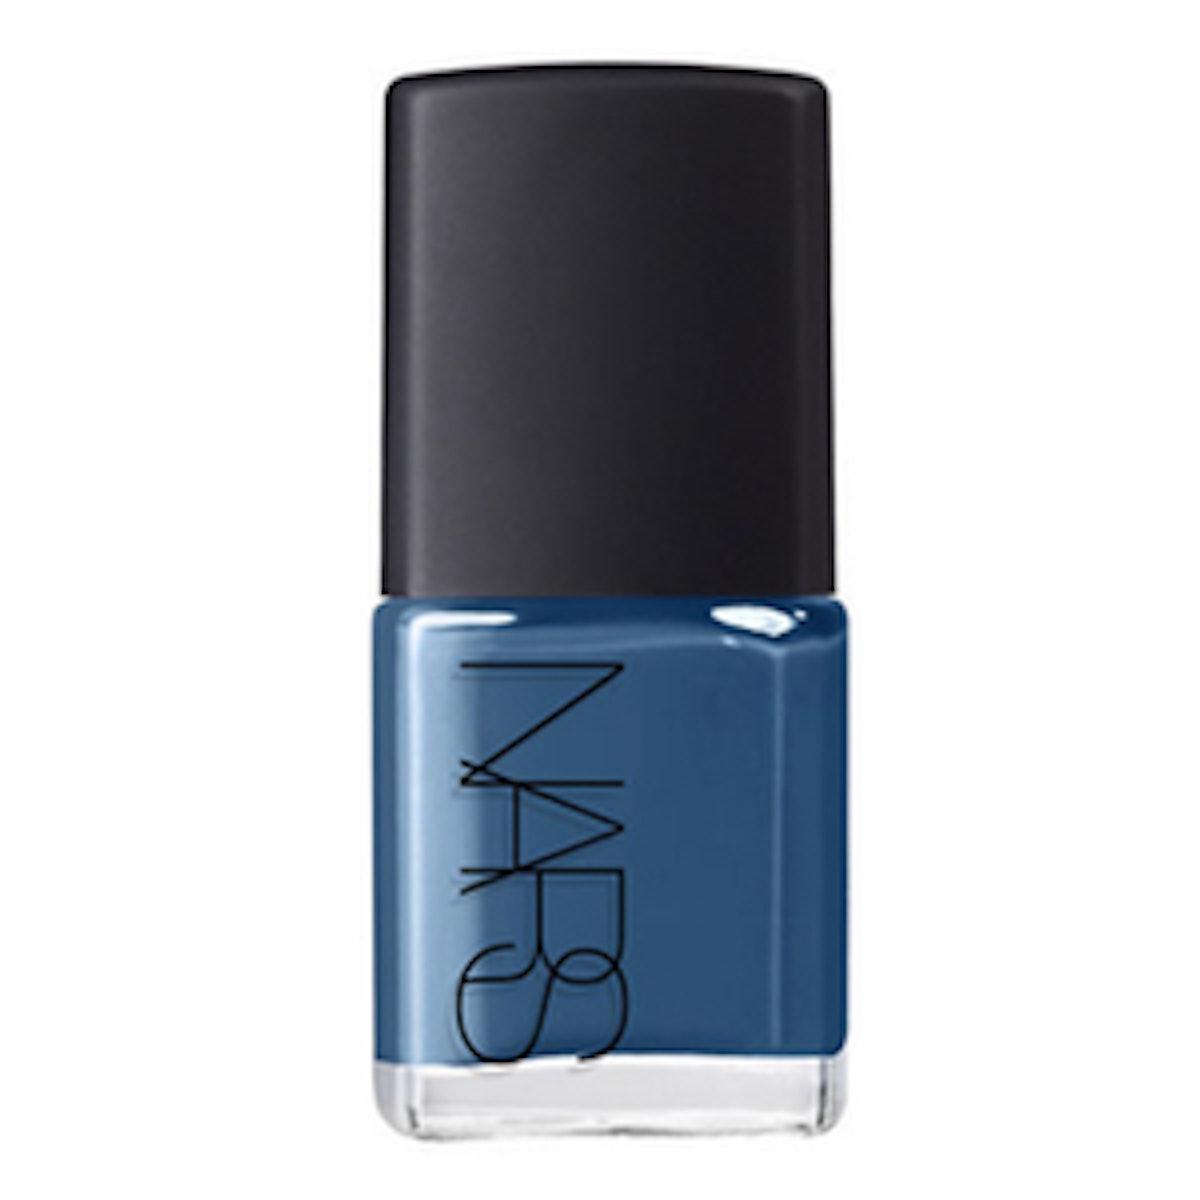 Nail Polish in Mots Bleus